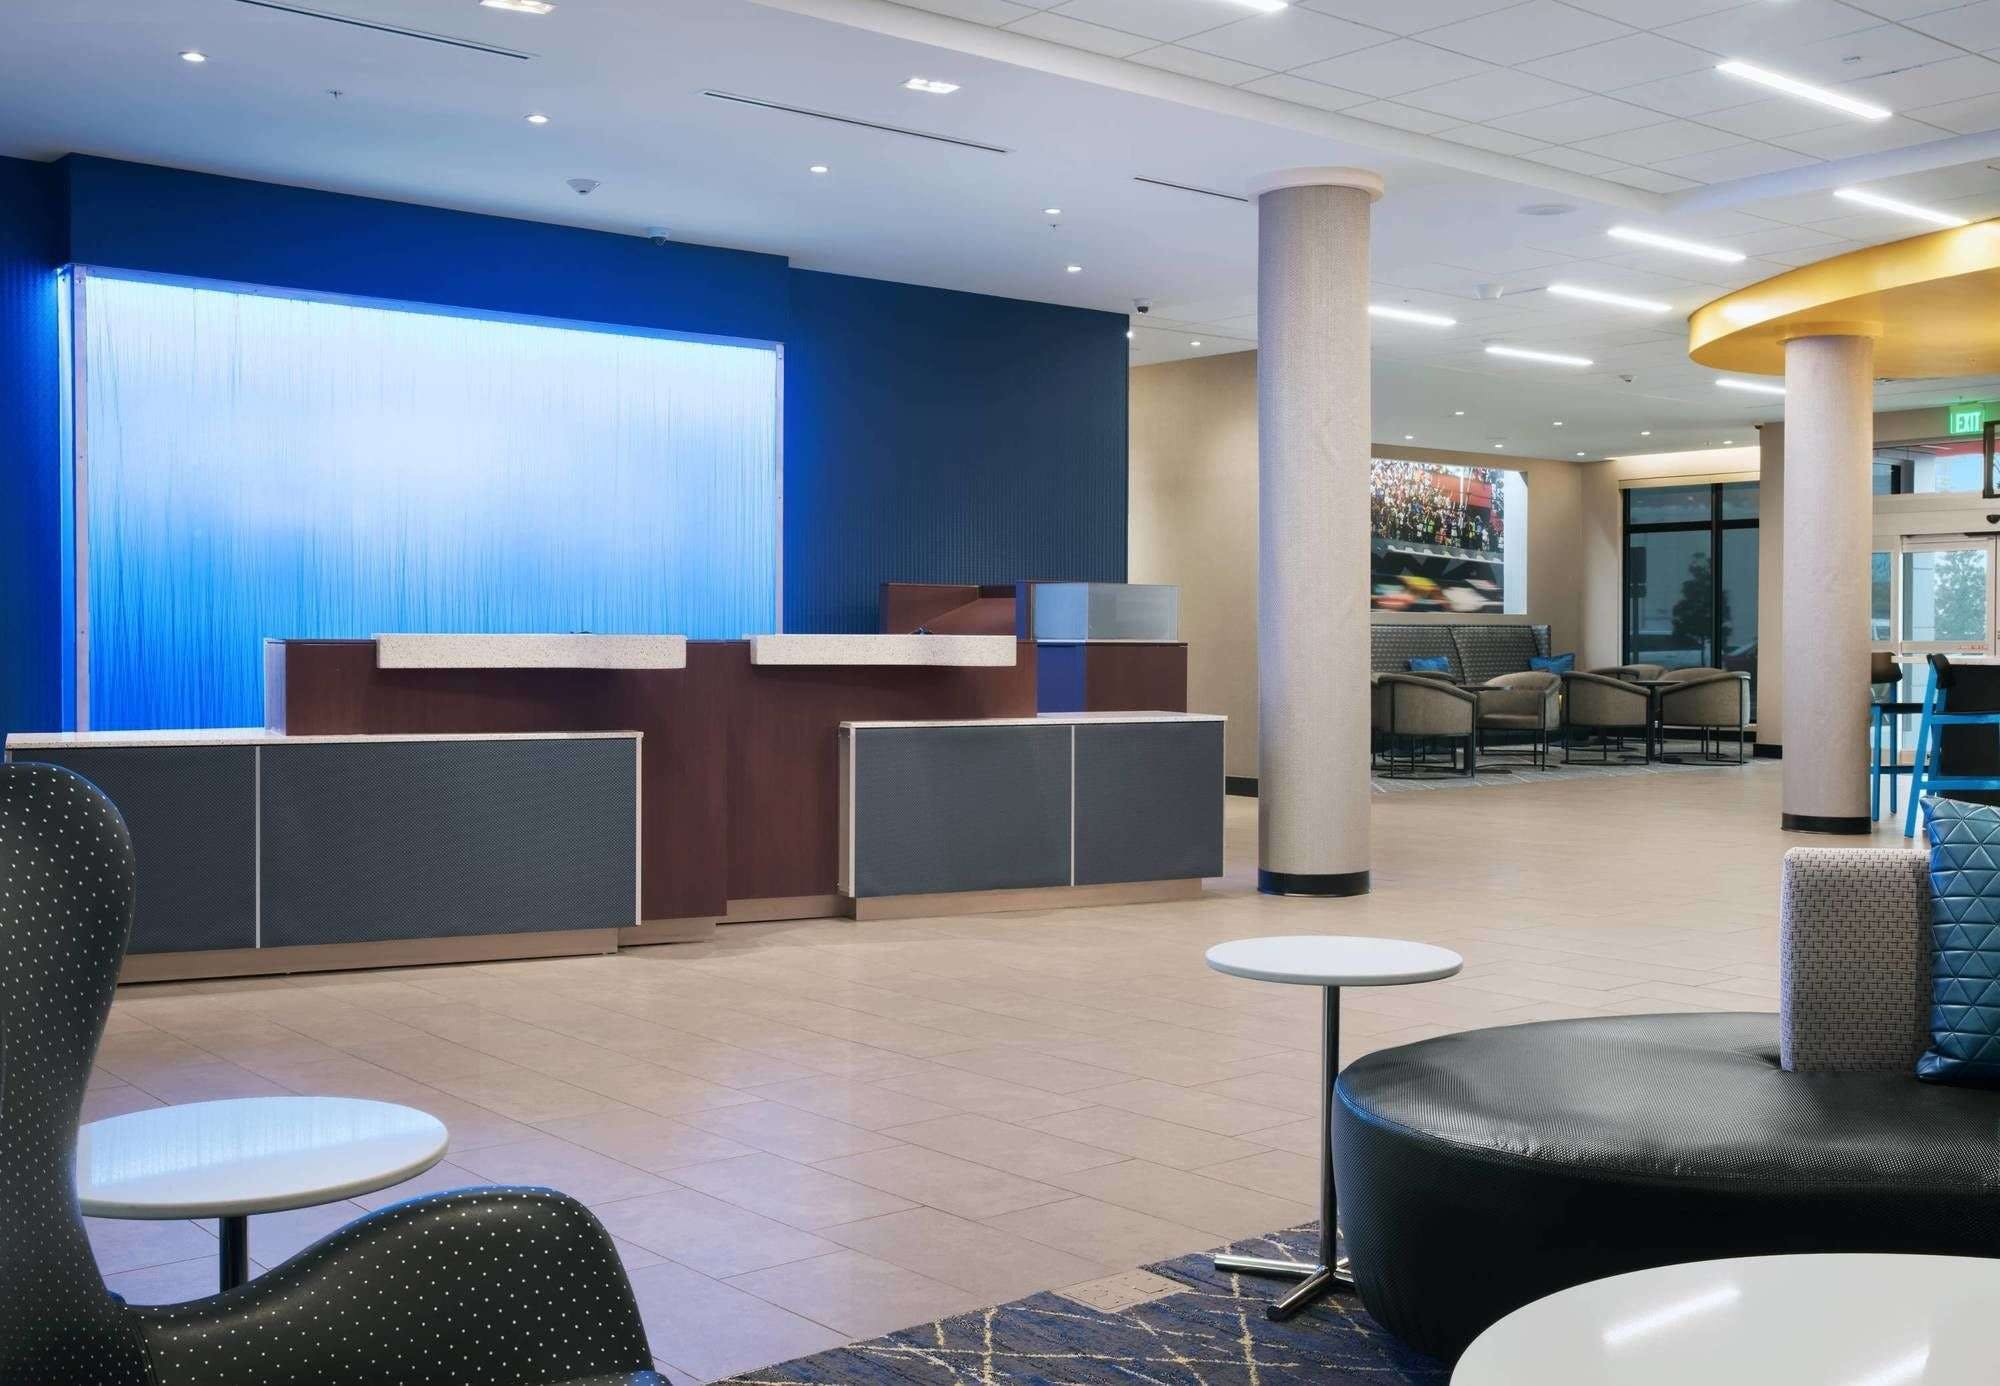 Fairfield Inn & Suites by Marriott Daytona Beach Speedway/Airport